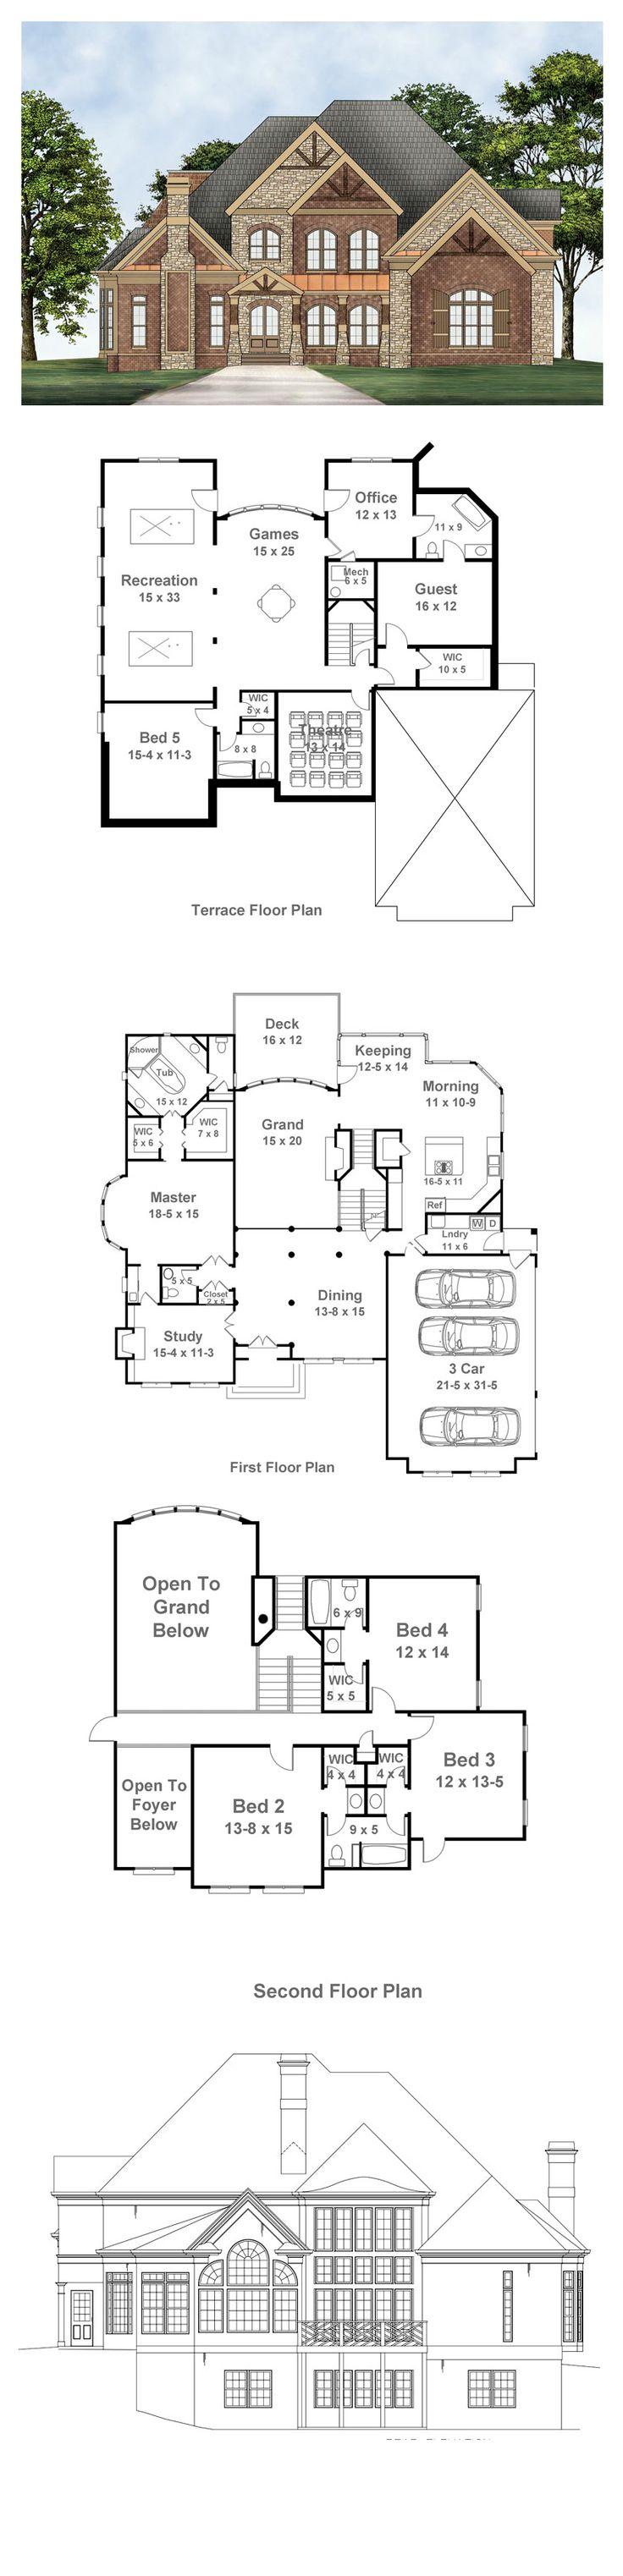 Greek Revival House Plan 72096 Total Living Area 3143